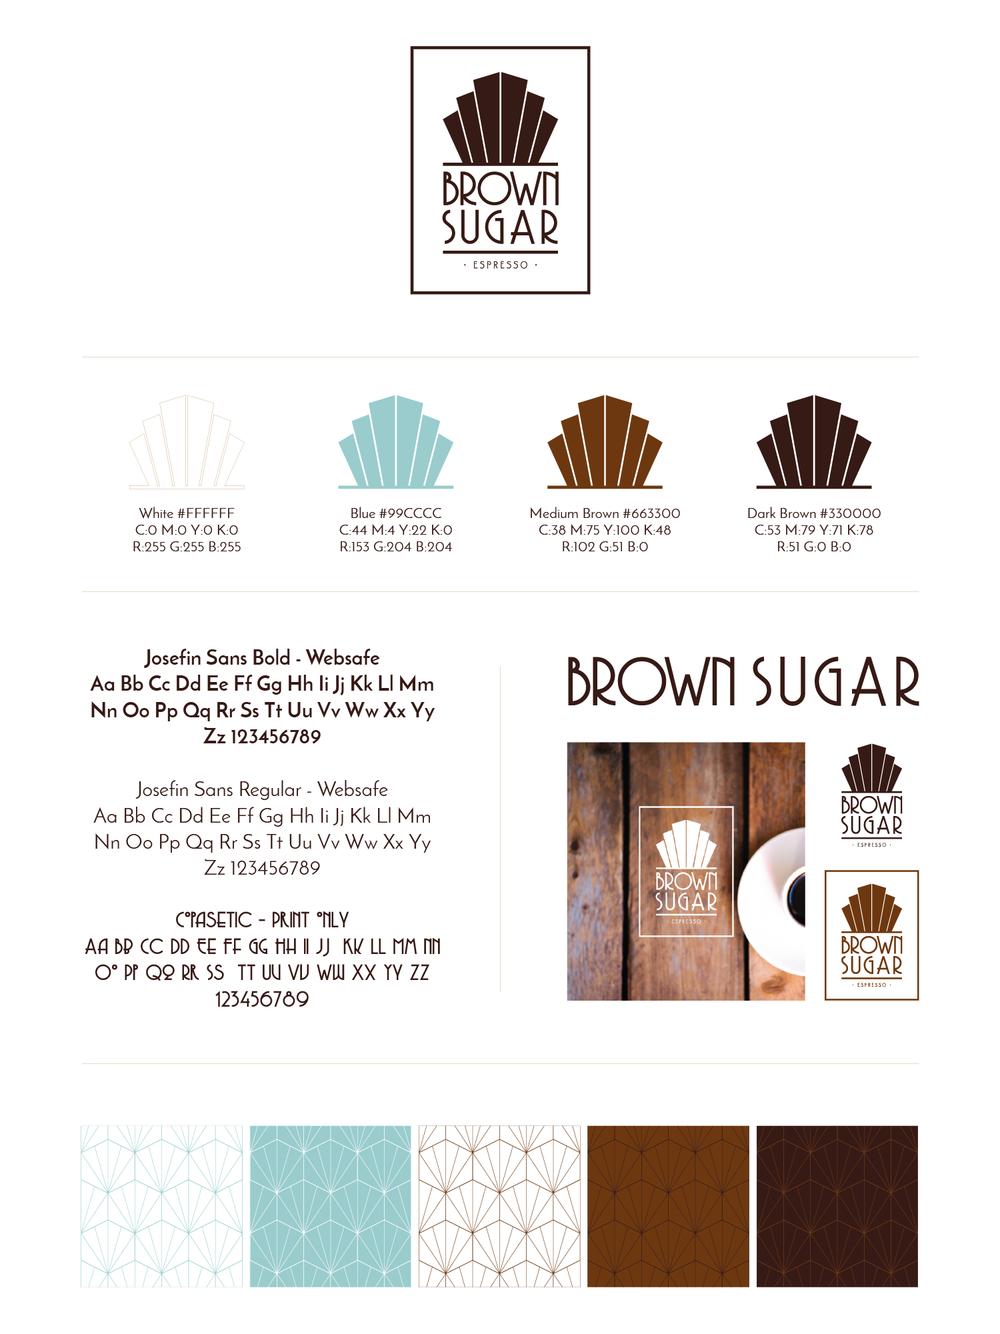 Brown Sugar Espresso Branding Board